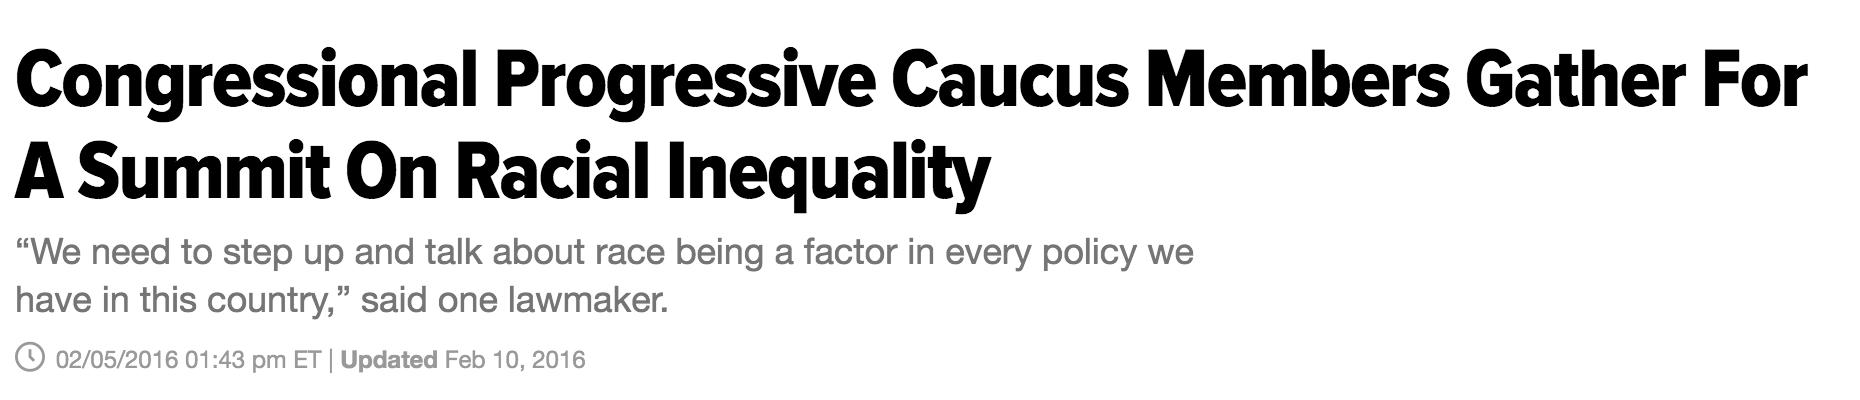 Huffington Post , Feb. 10, 2016.